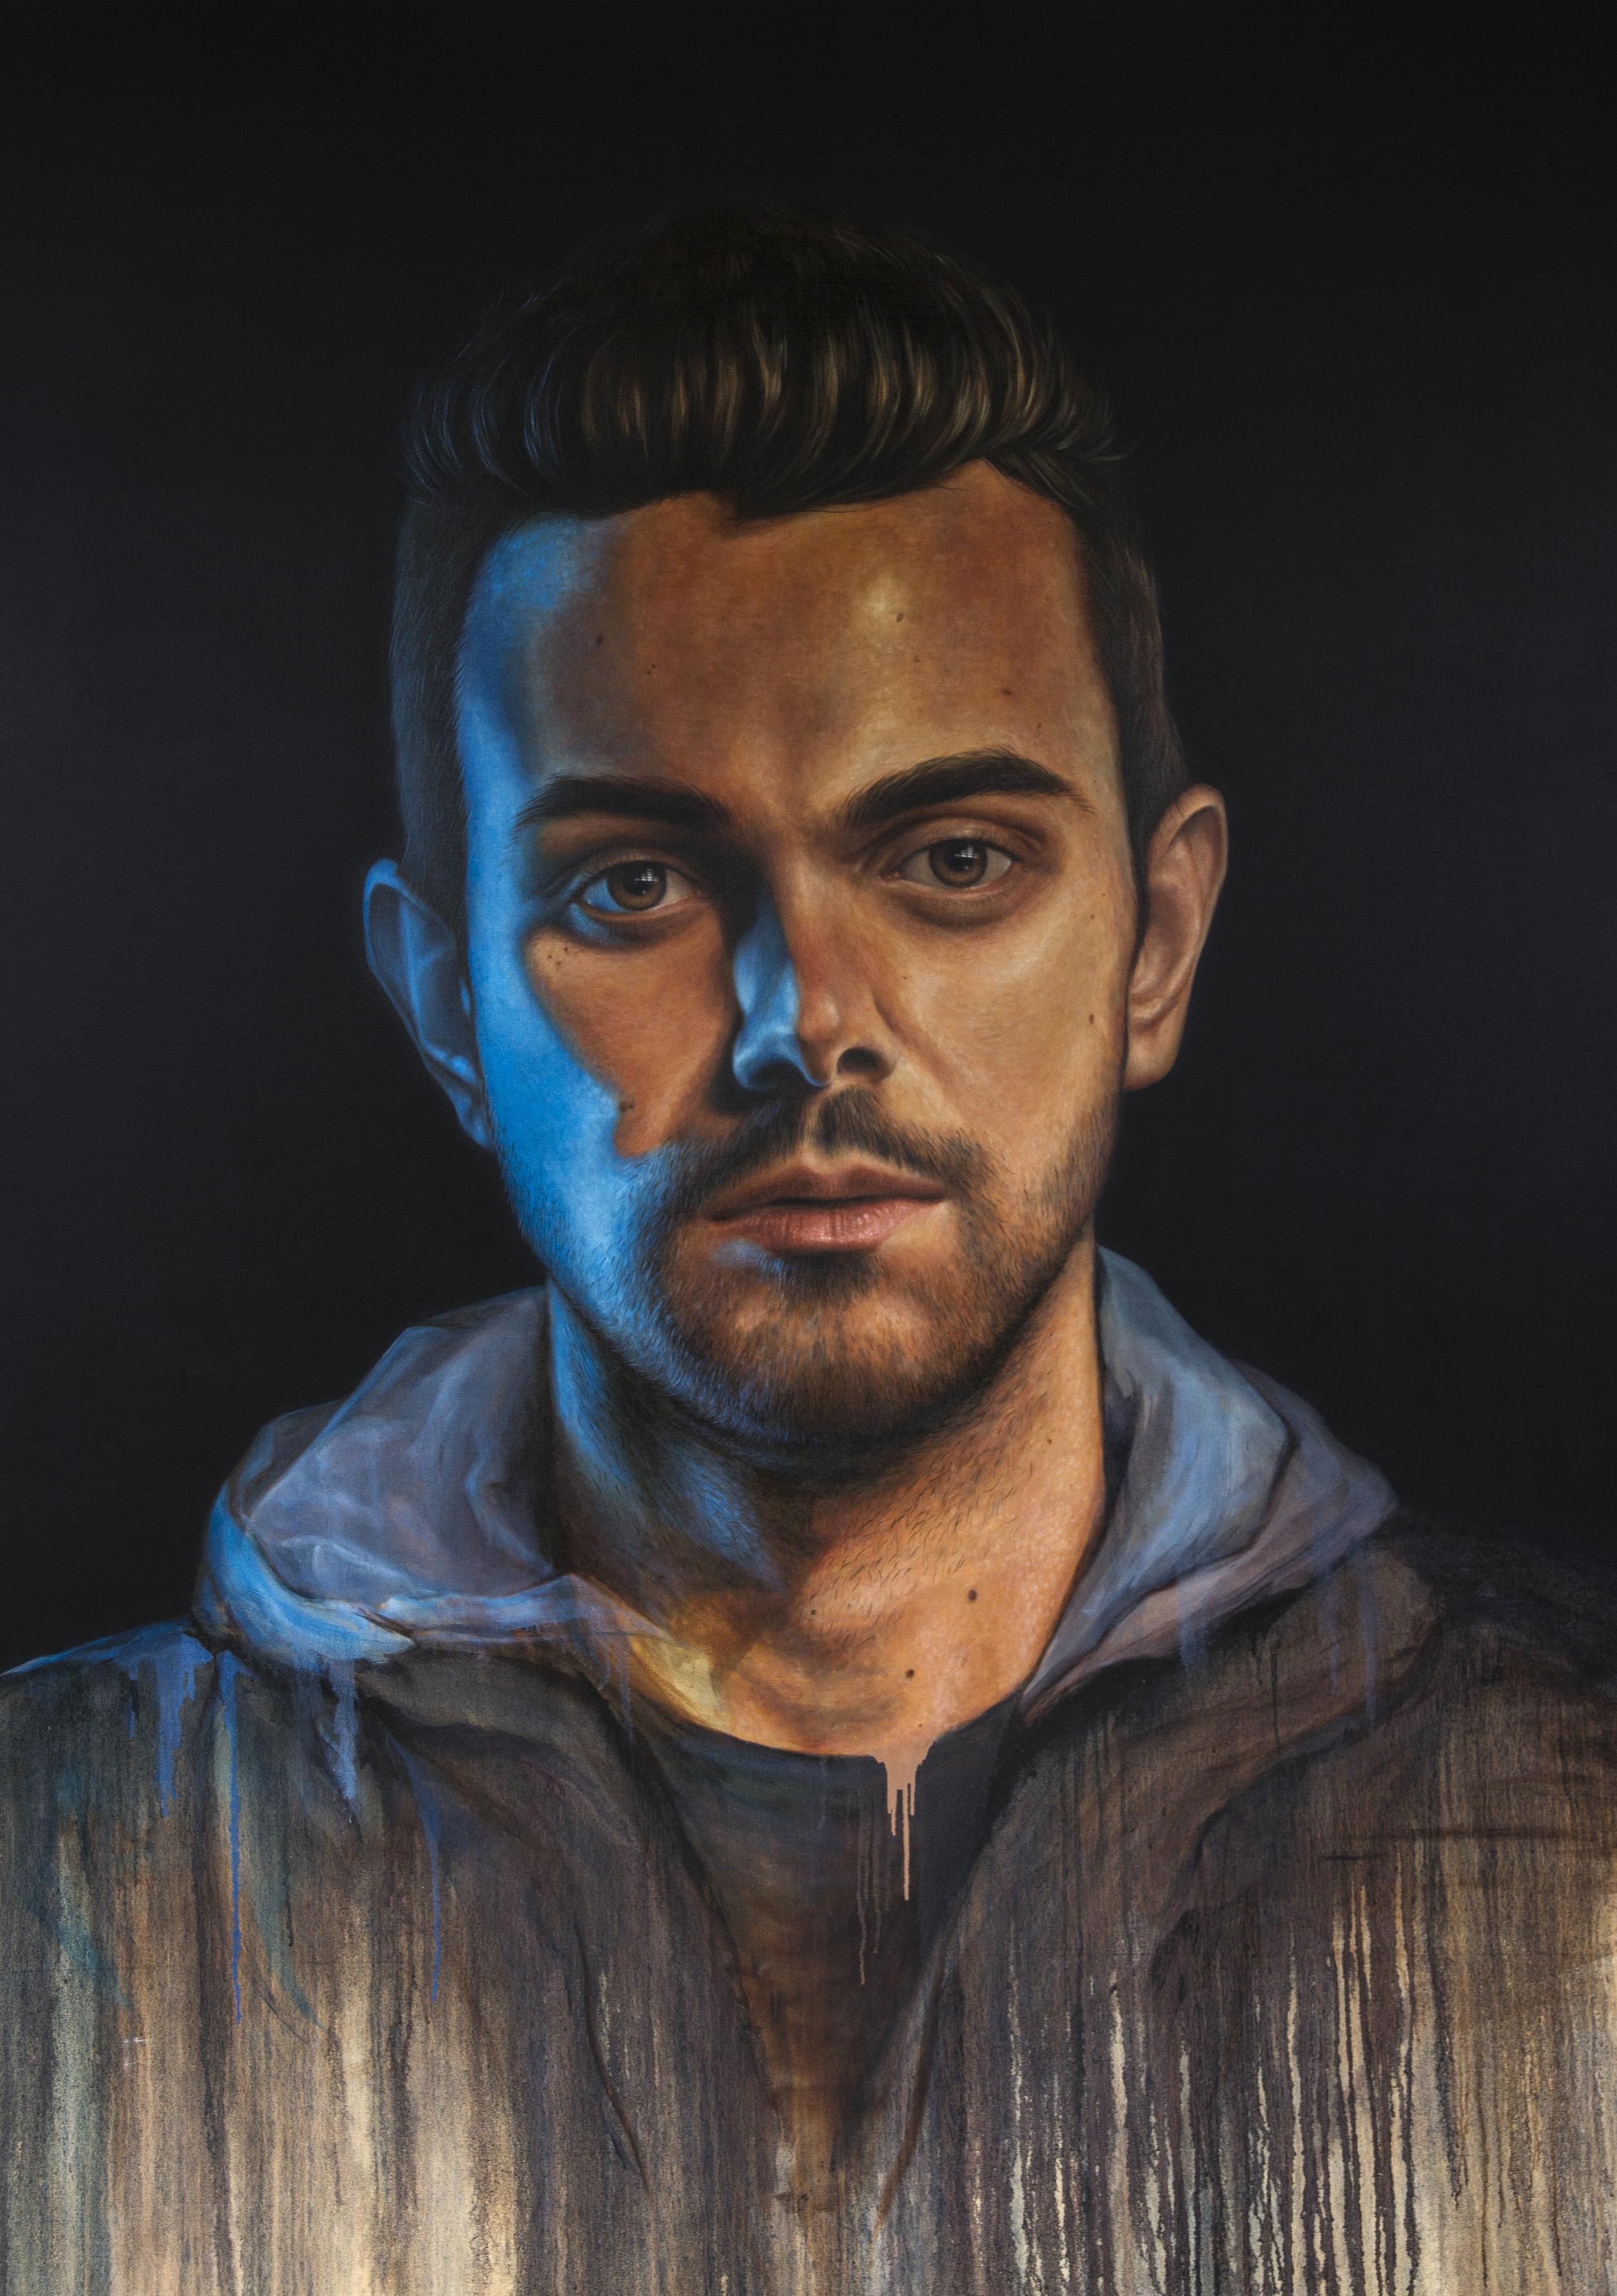 'Portrait of Tom Iansek'